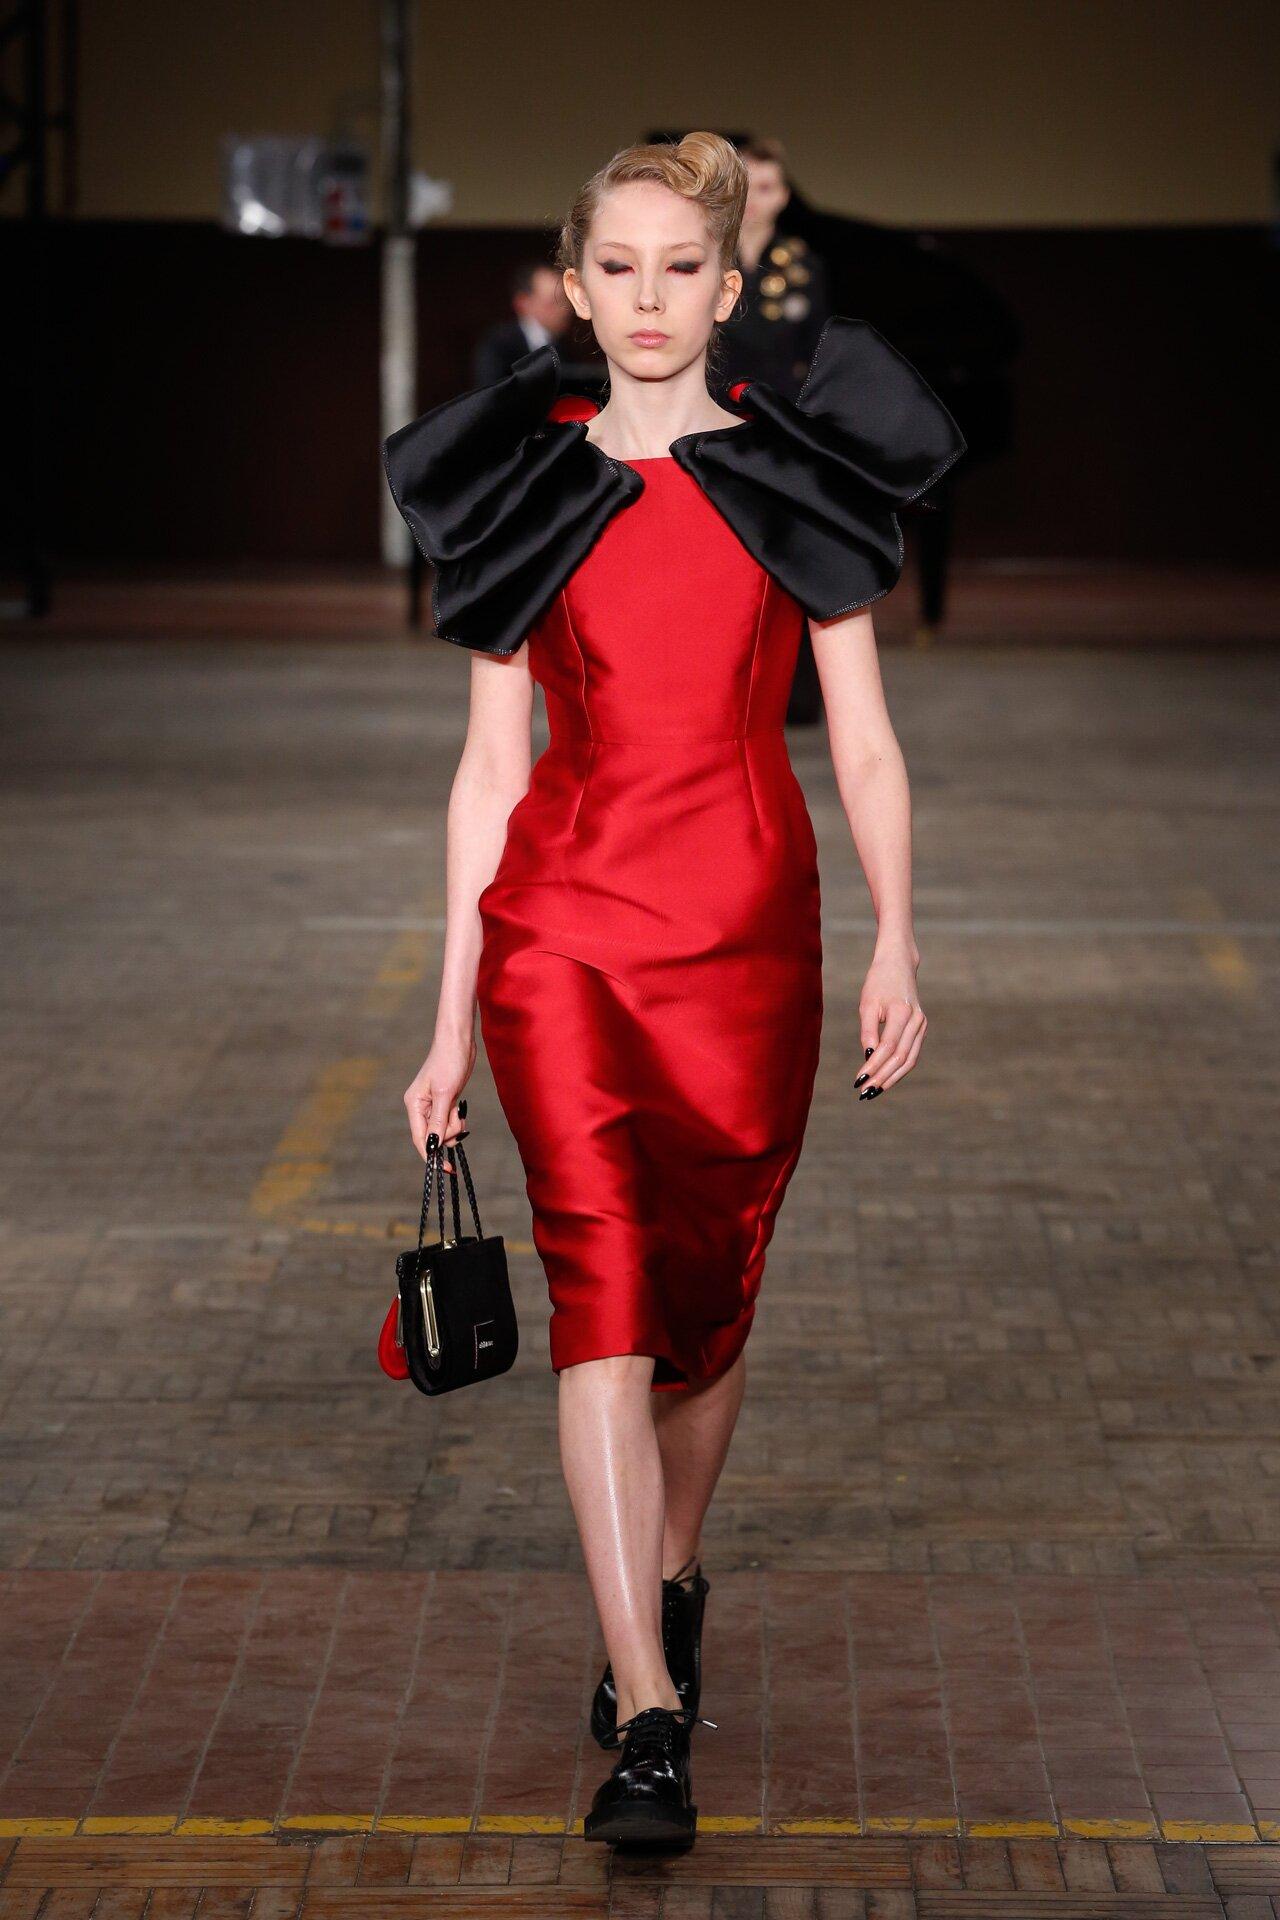 Antonio Marras Fall Winter 2018-19 Fashion Show Look 2